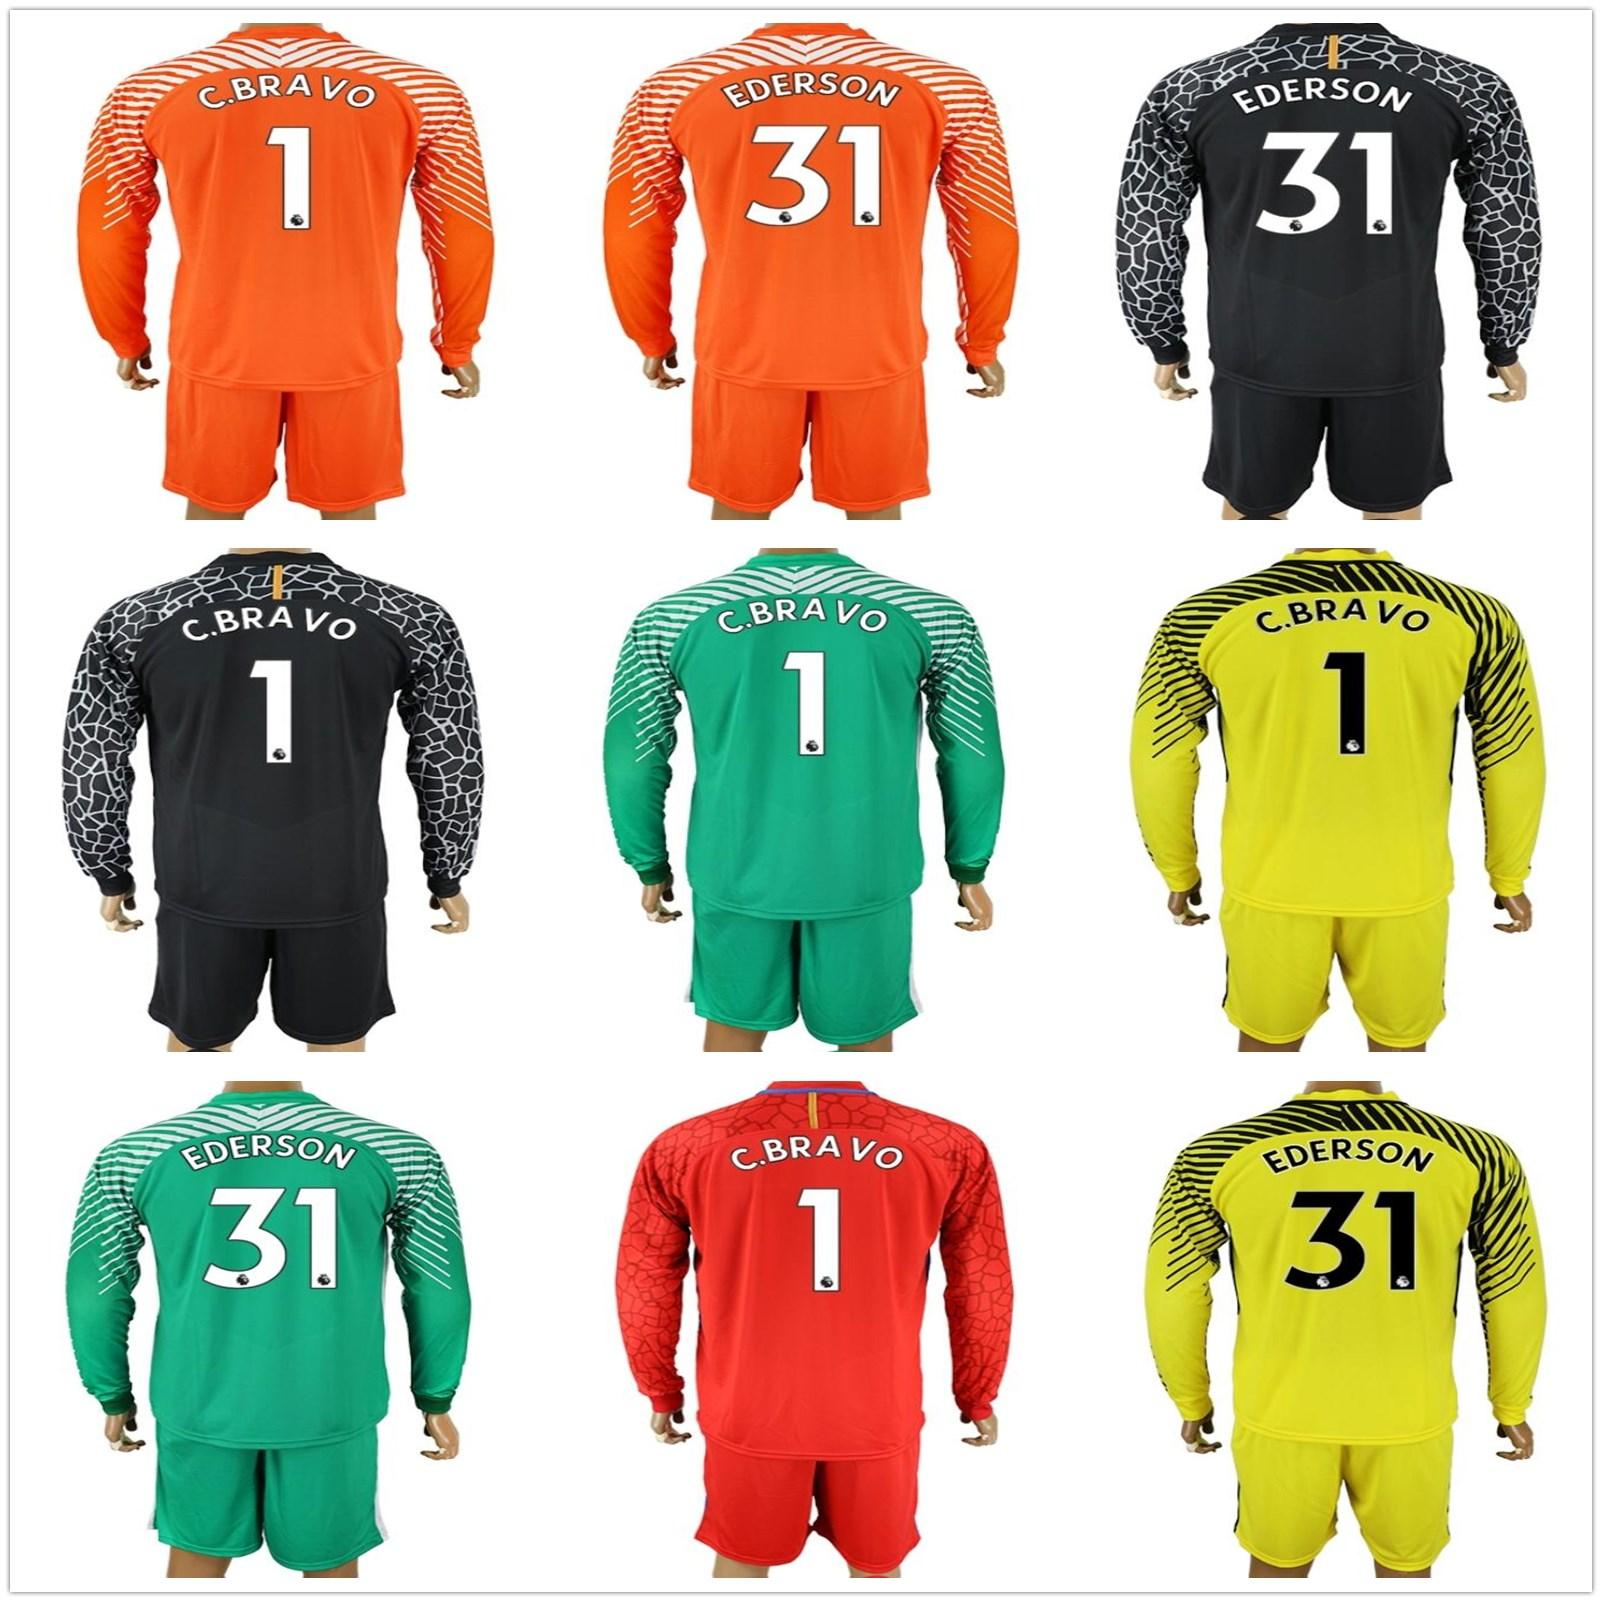 862c1de39cd ... best 2018 2017 2018 long sleeve blue moon soccer jerseys claudio bravo  goalkeeper jersey c.